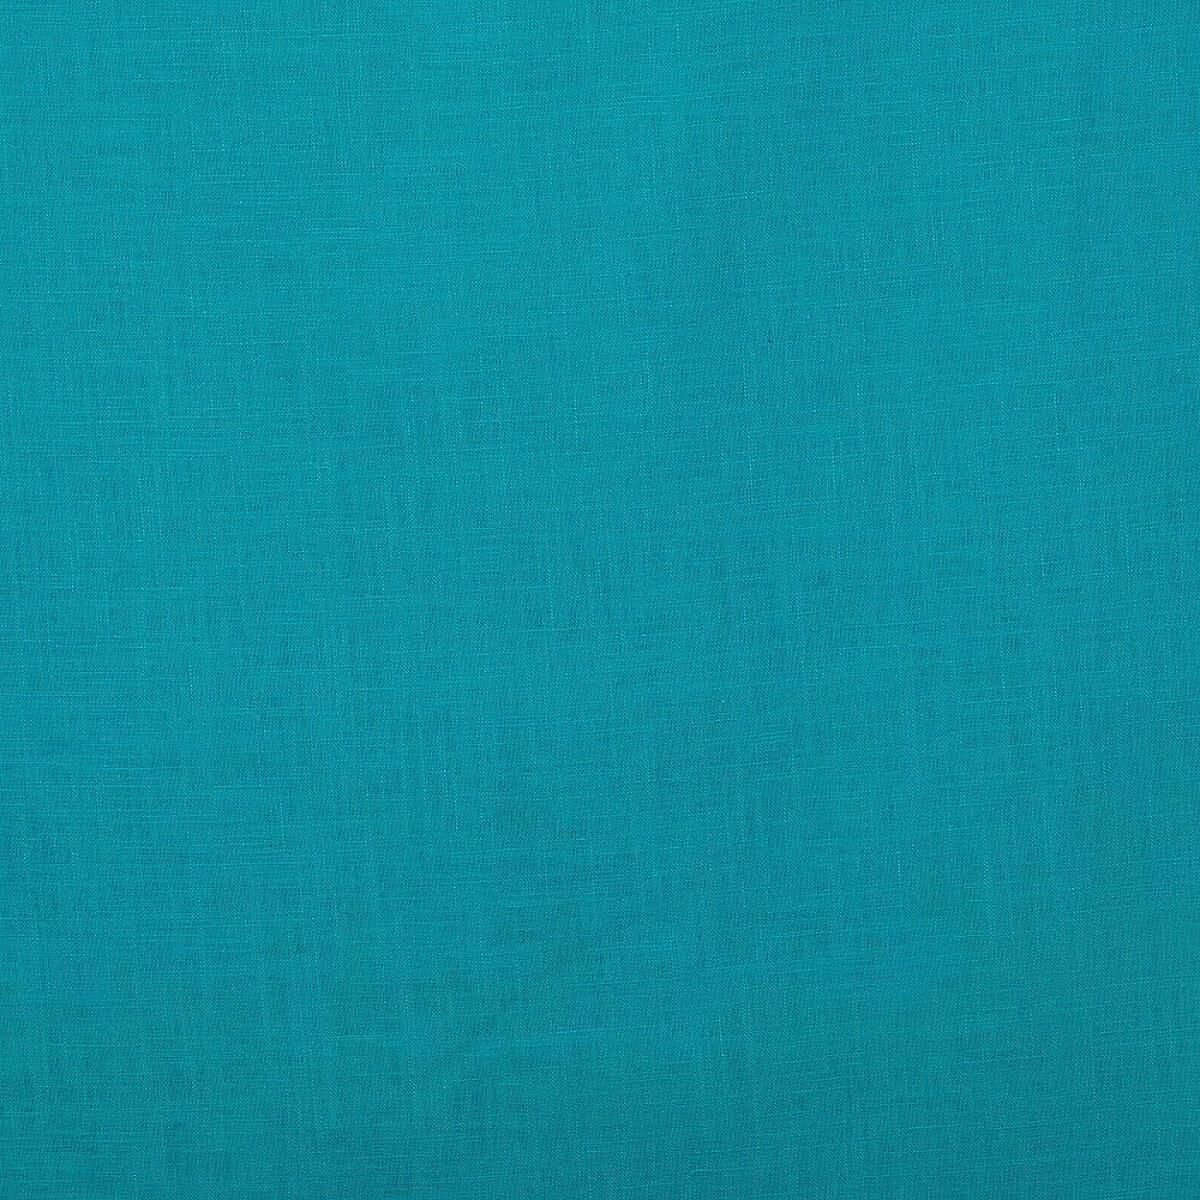 tissu lin uni bleu turquoise mercerie car fil. Black Bedroom Furniture Sets. Home Design Ideas